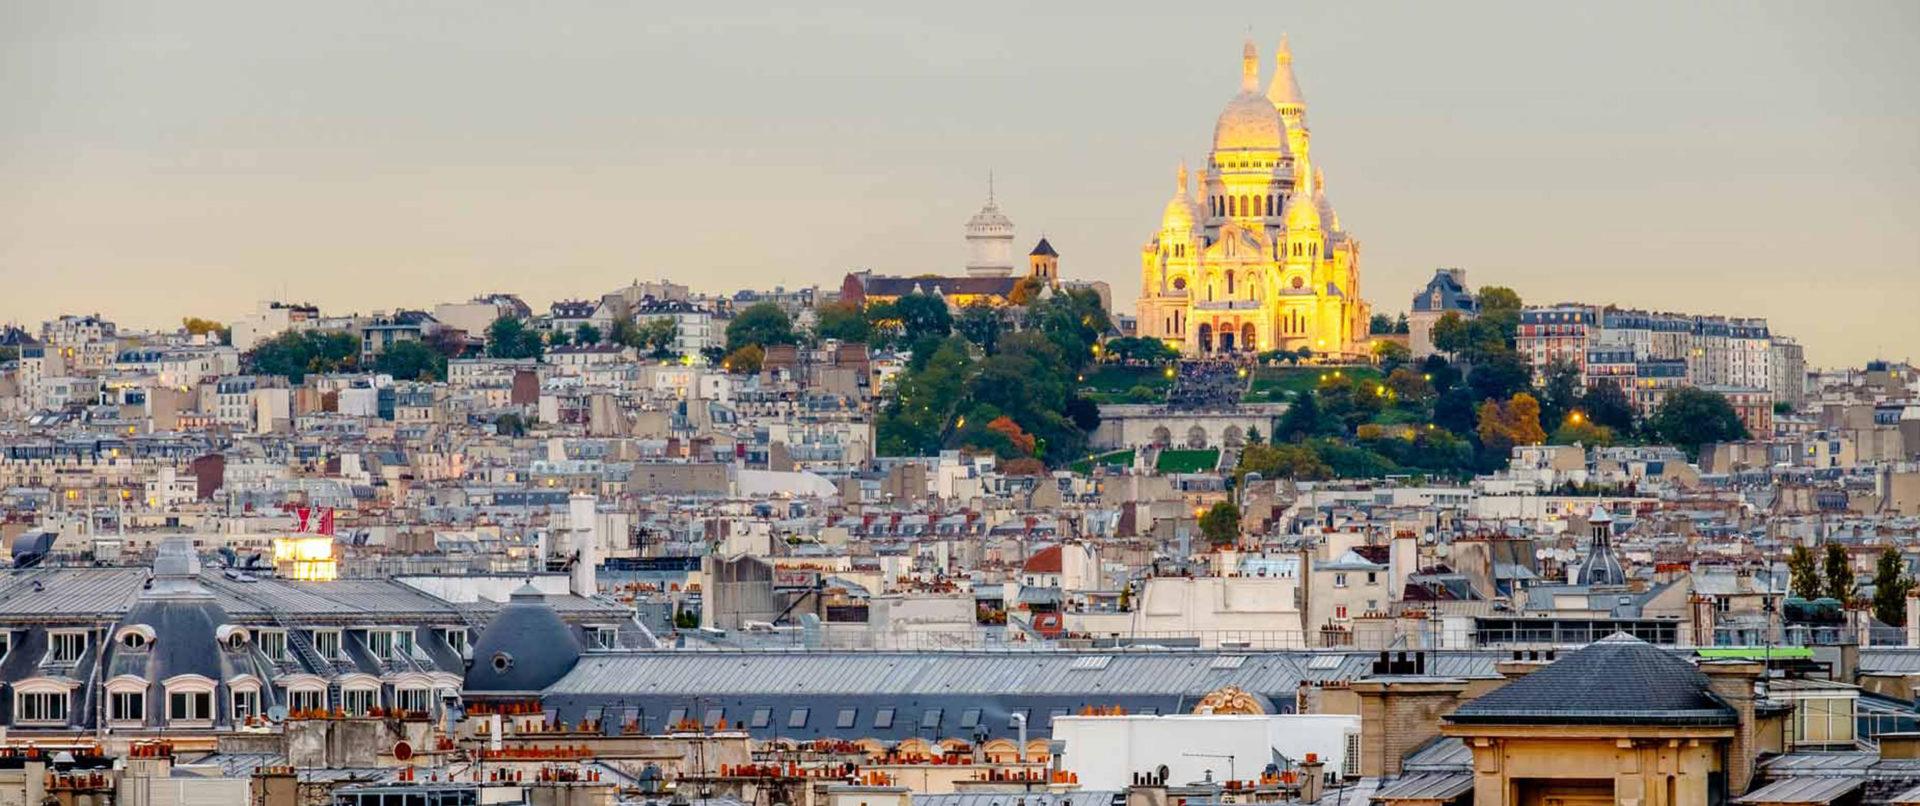 paris-best-of-day-visit-van